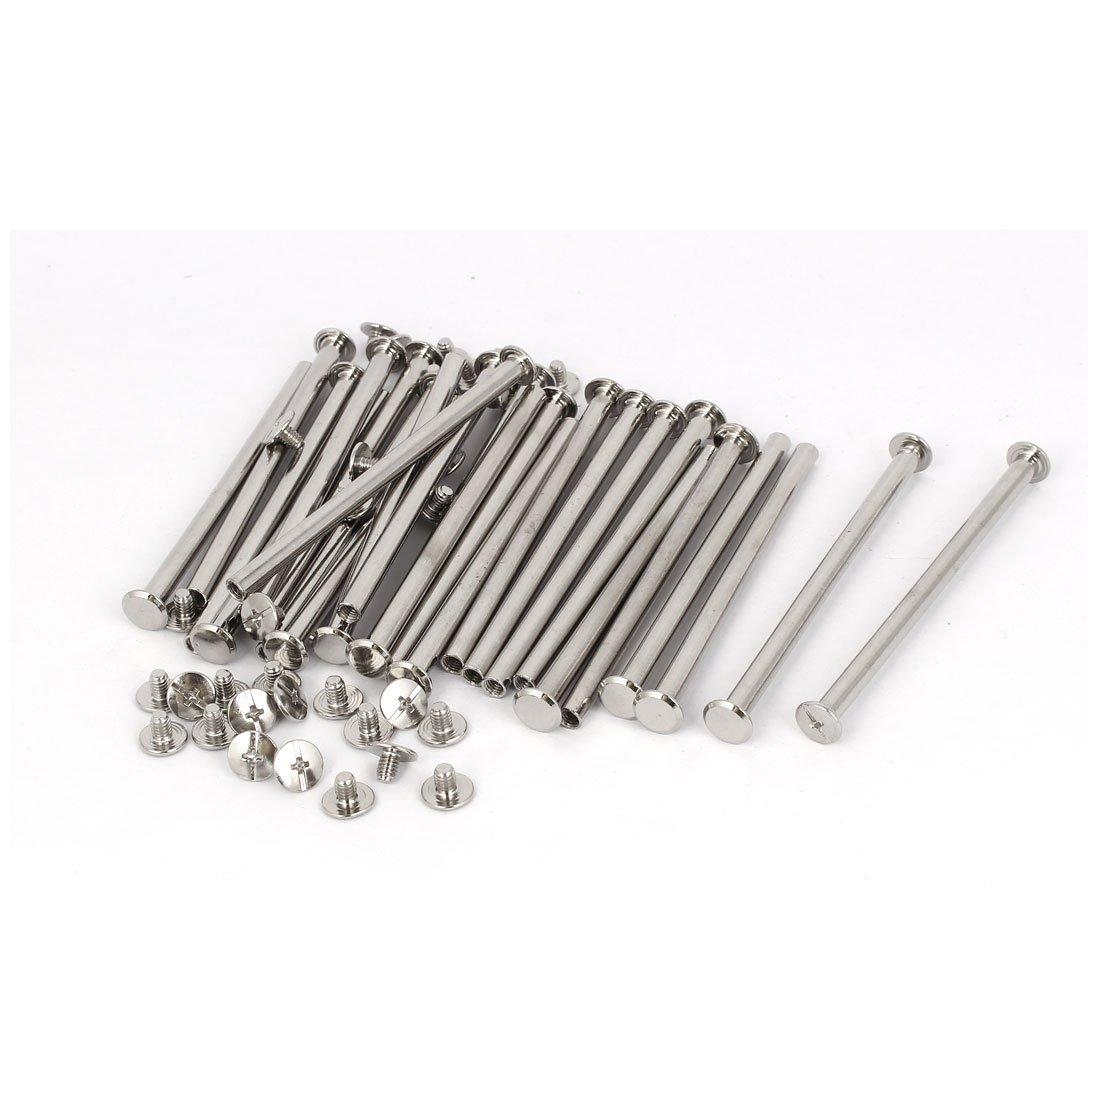 uxcell Photo Albums M5 x 85mm Aluminum Binding Screw Post Silver Tone 20pcs